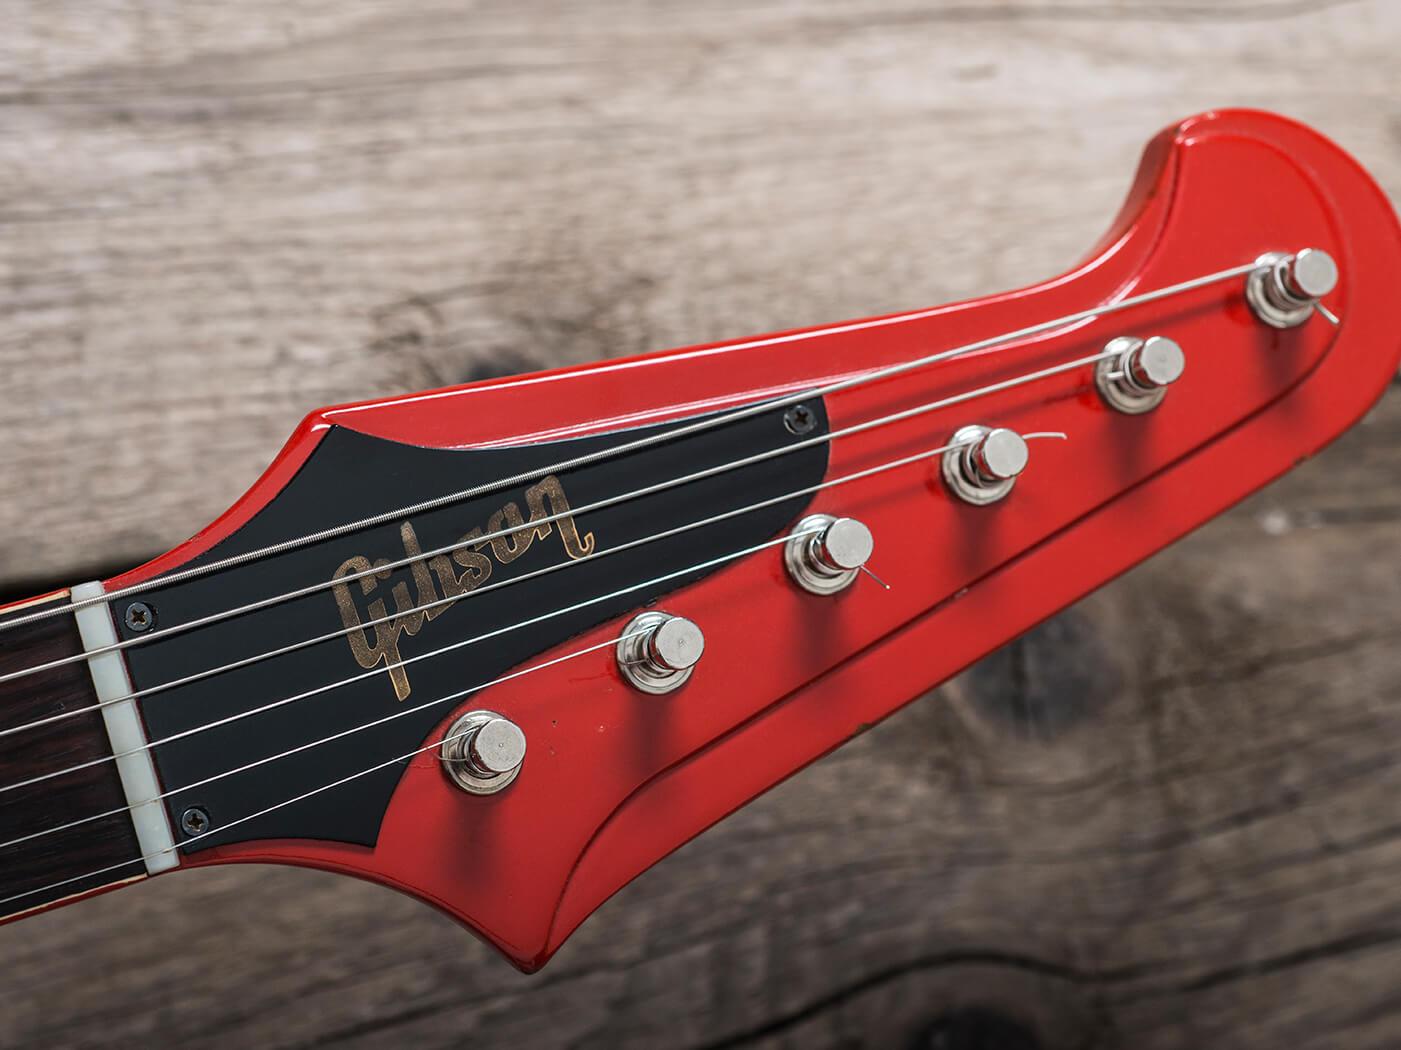 Gibson 1964 Firebird III red headstock